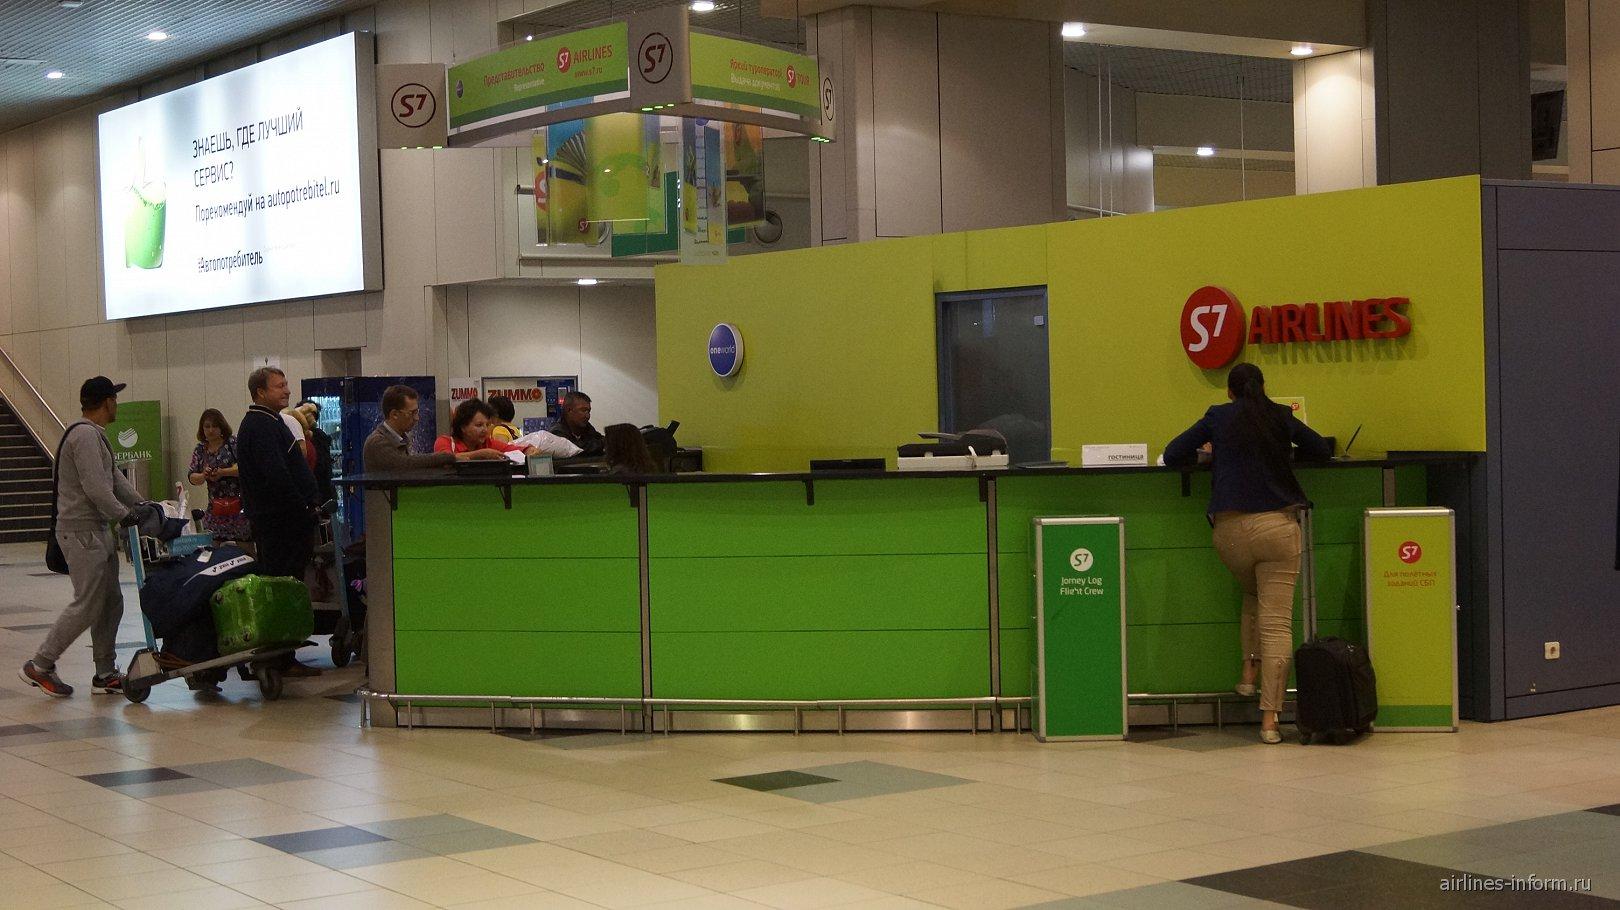 Представительство авиакомпании S7 Airlines в аэропорту Москва Домодедово